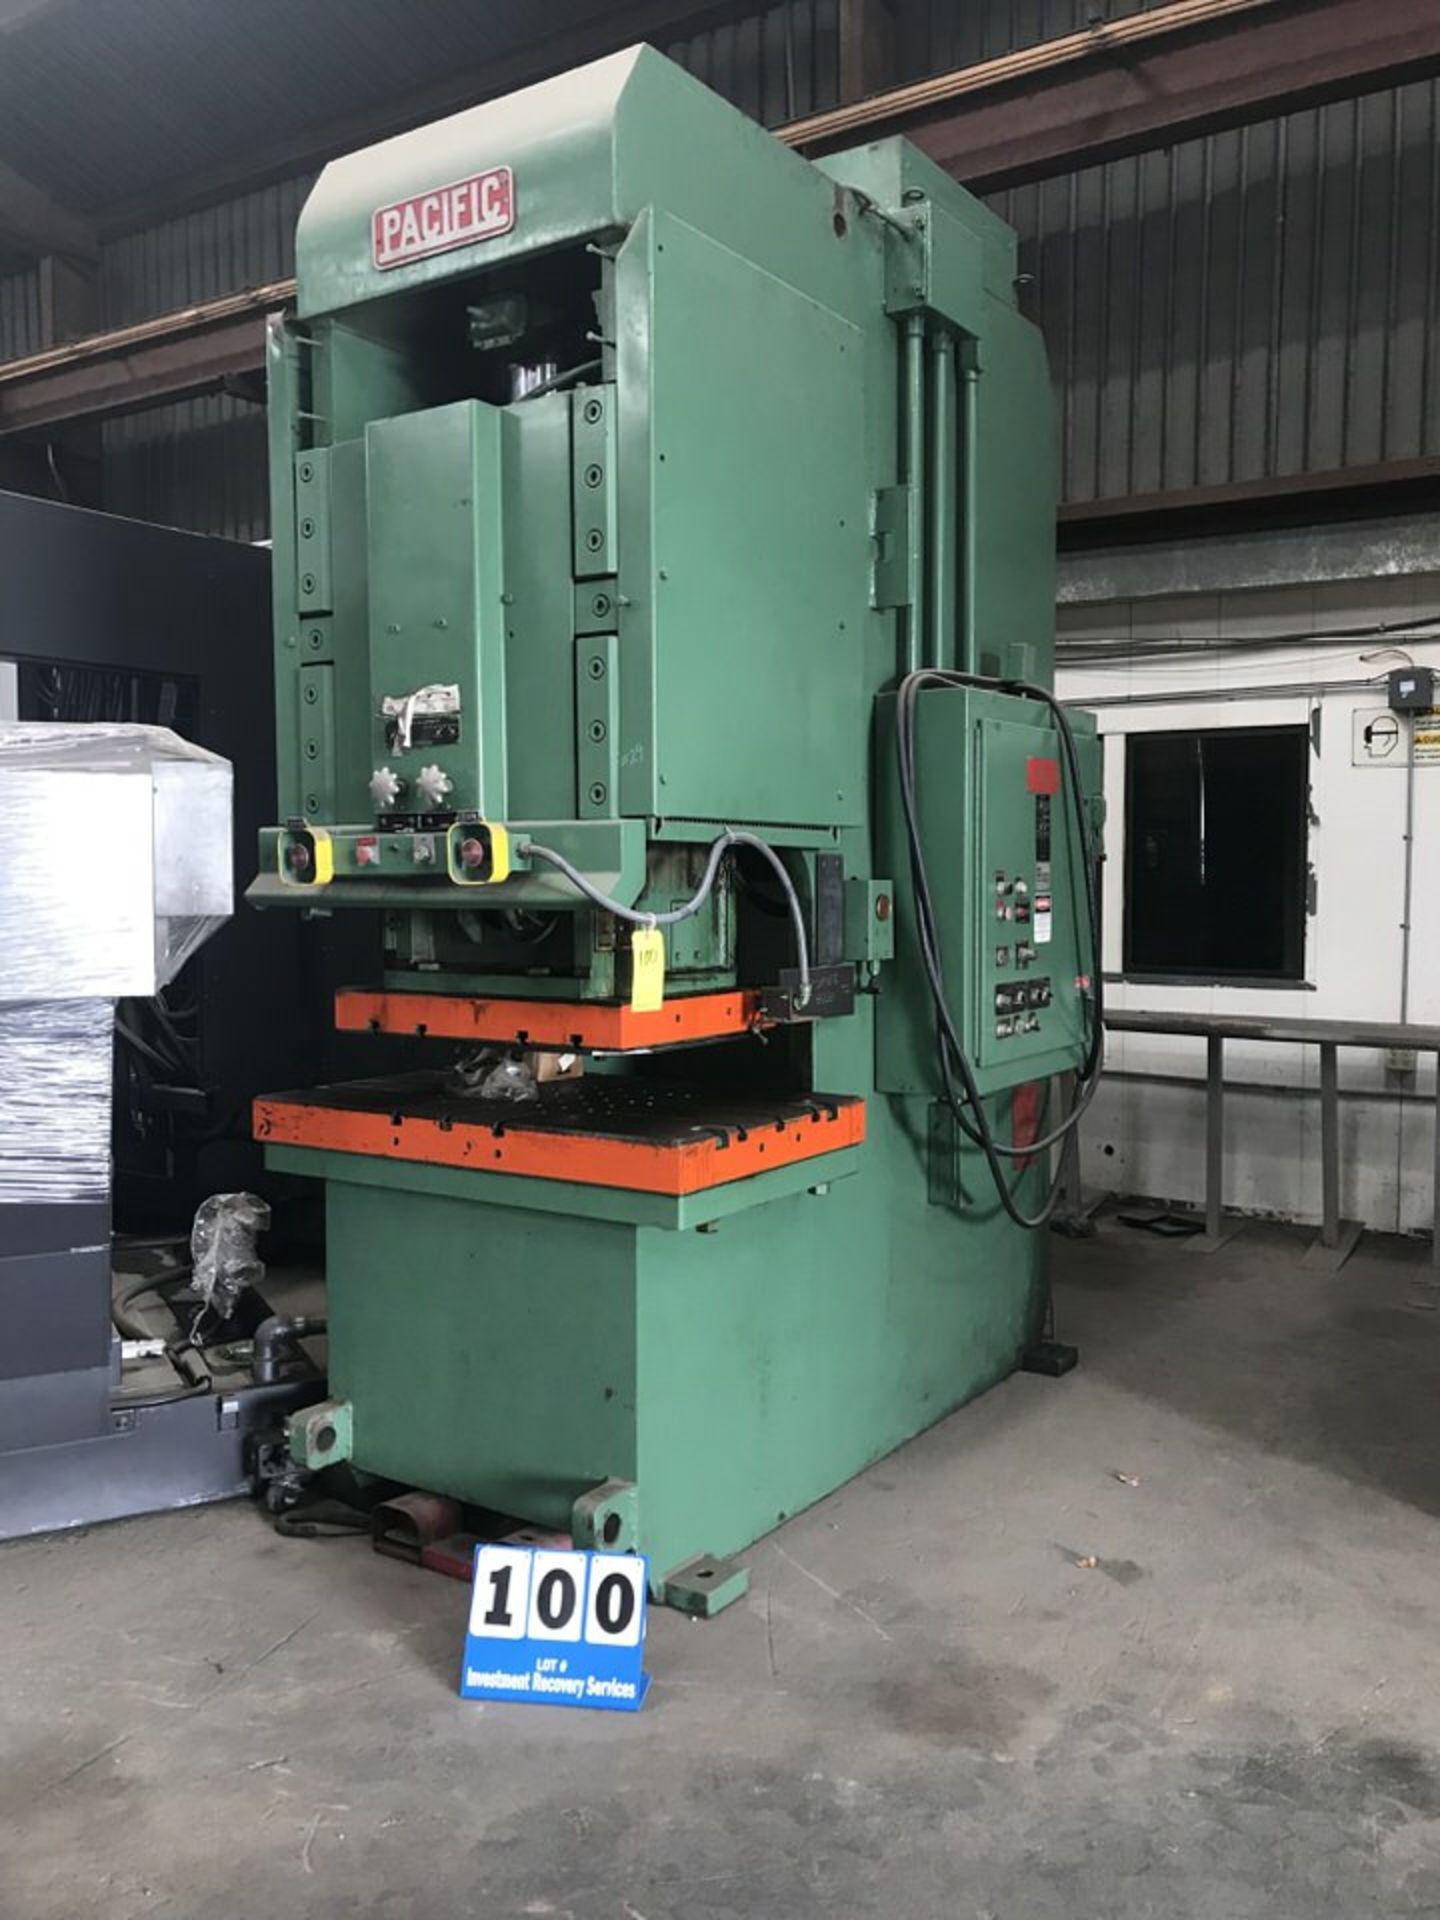 "Lot 100 - Pacific Hydraulic Press, Mdl:150 PF OBS, Cap: 150 Ton, Bed Bolster: 5' Thick x 30.5"" x 50.25"","